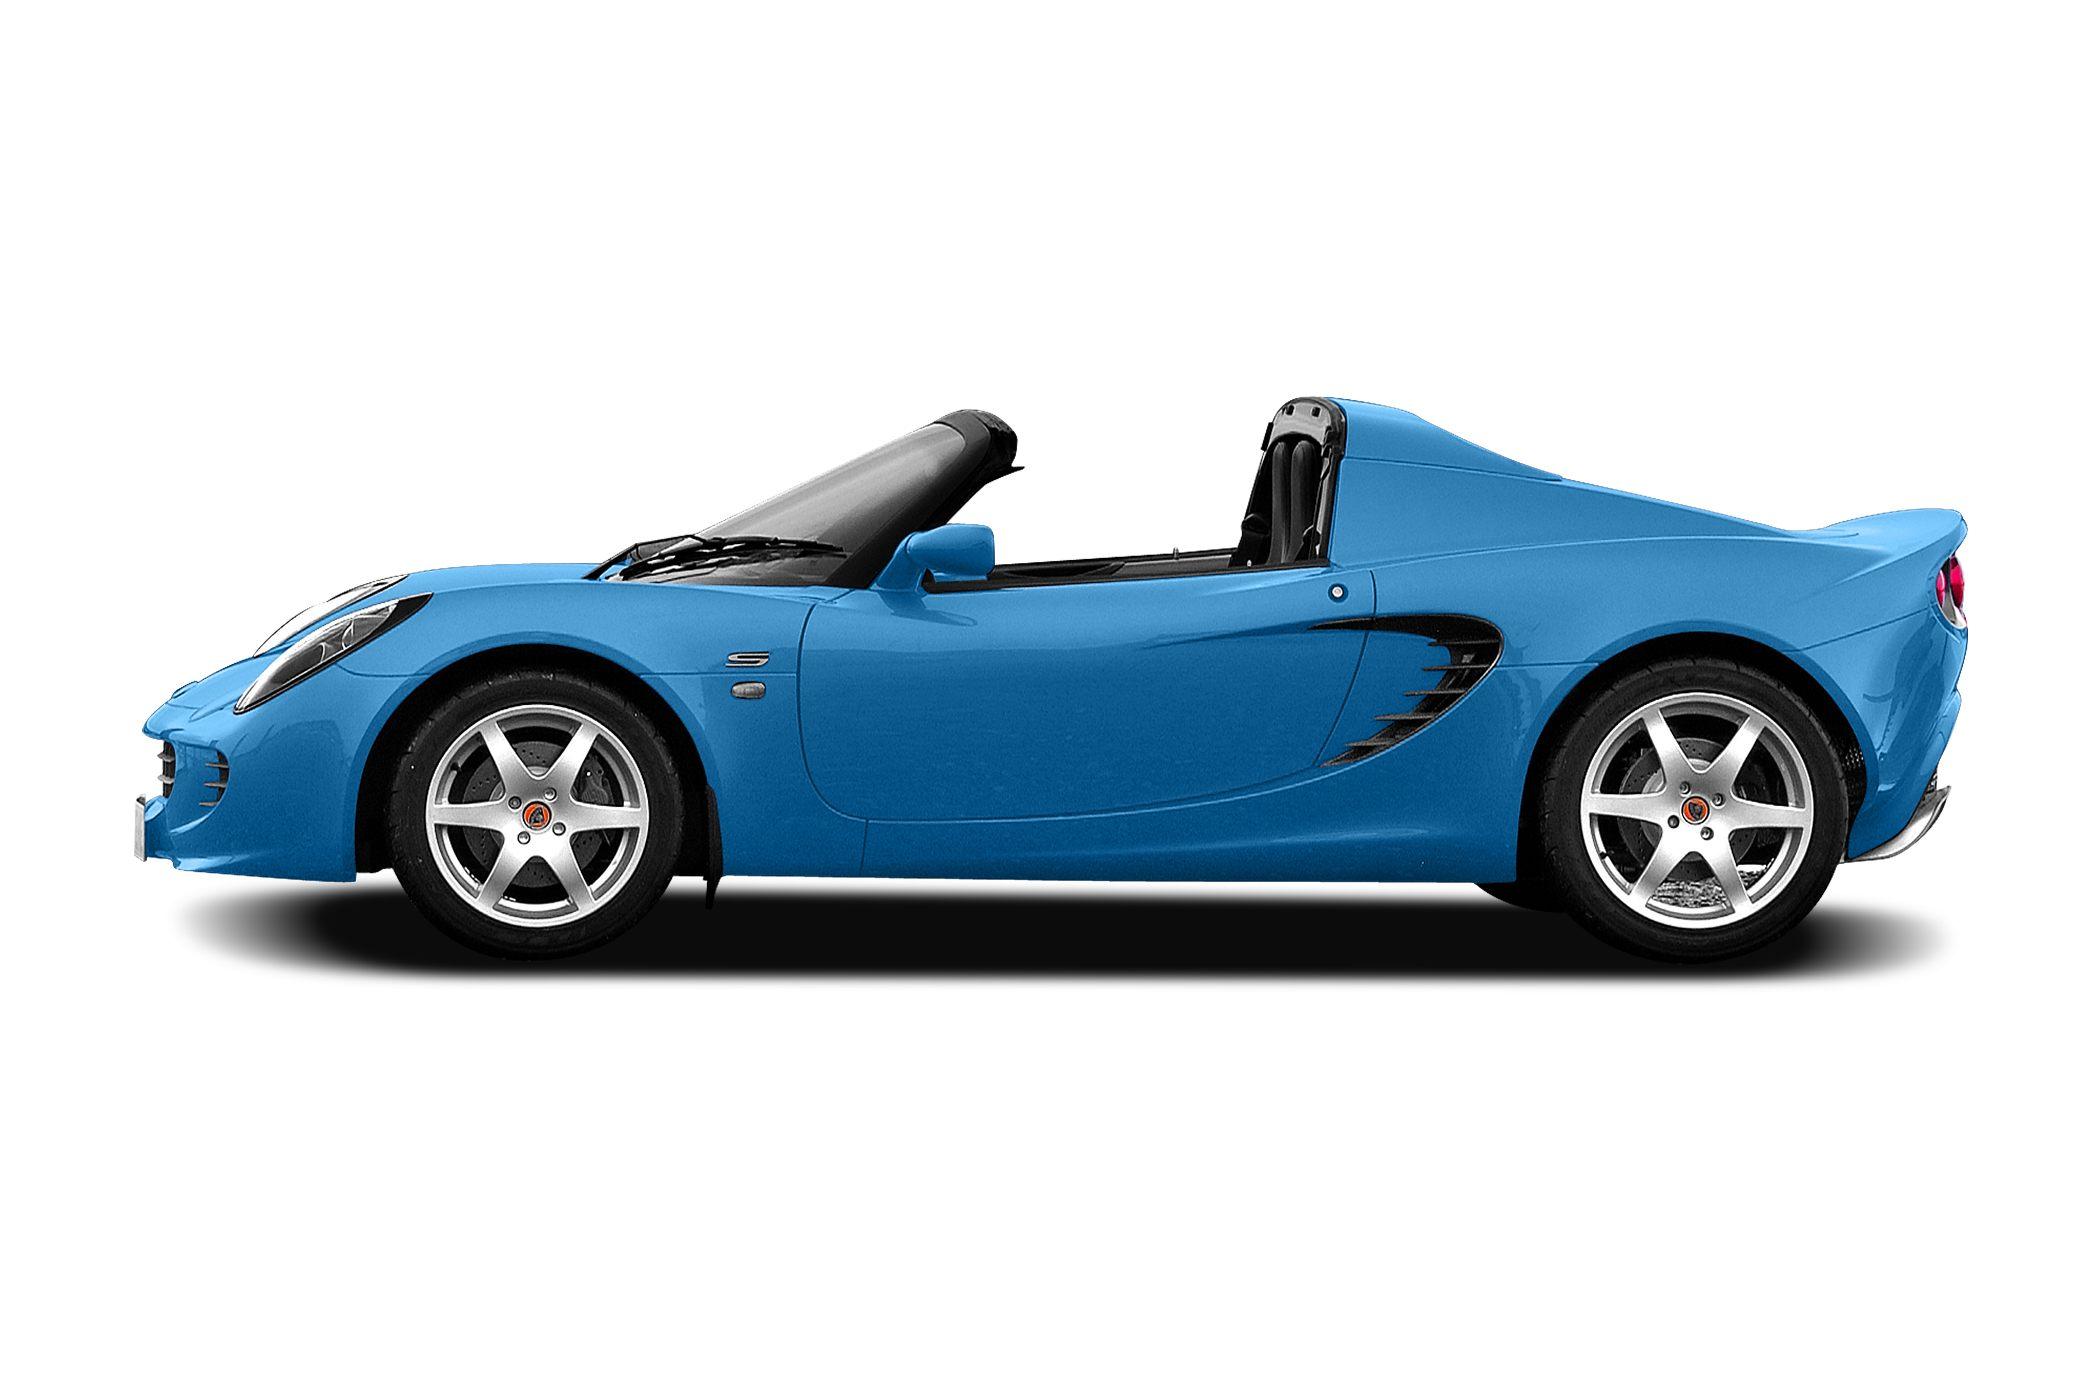 2007 lotus elise base convertible pricing and options 2007 lotus elise base convertible pricing and options